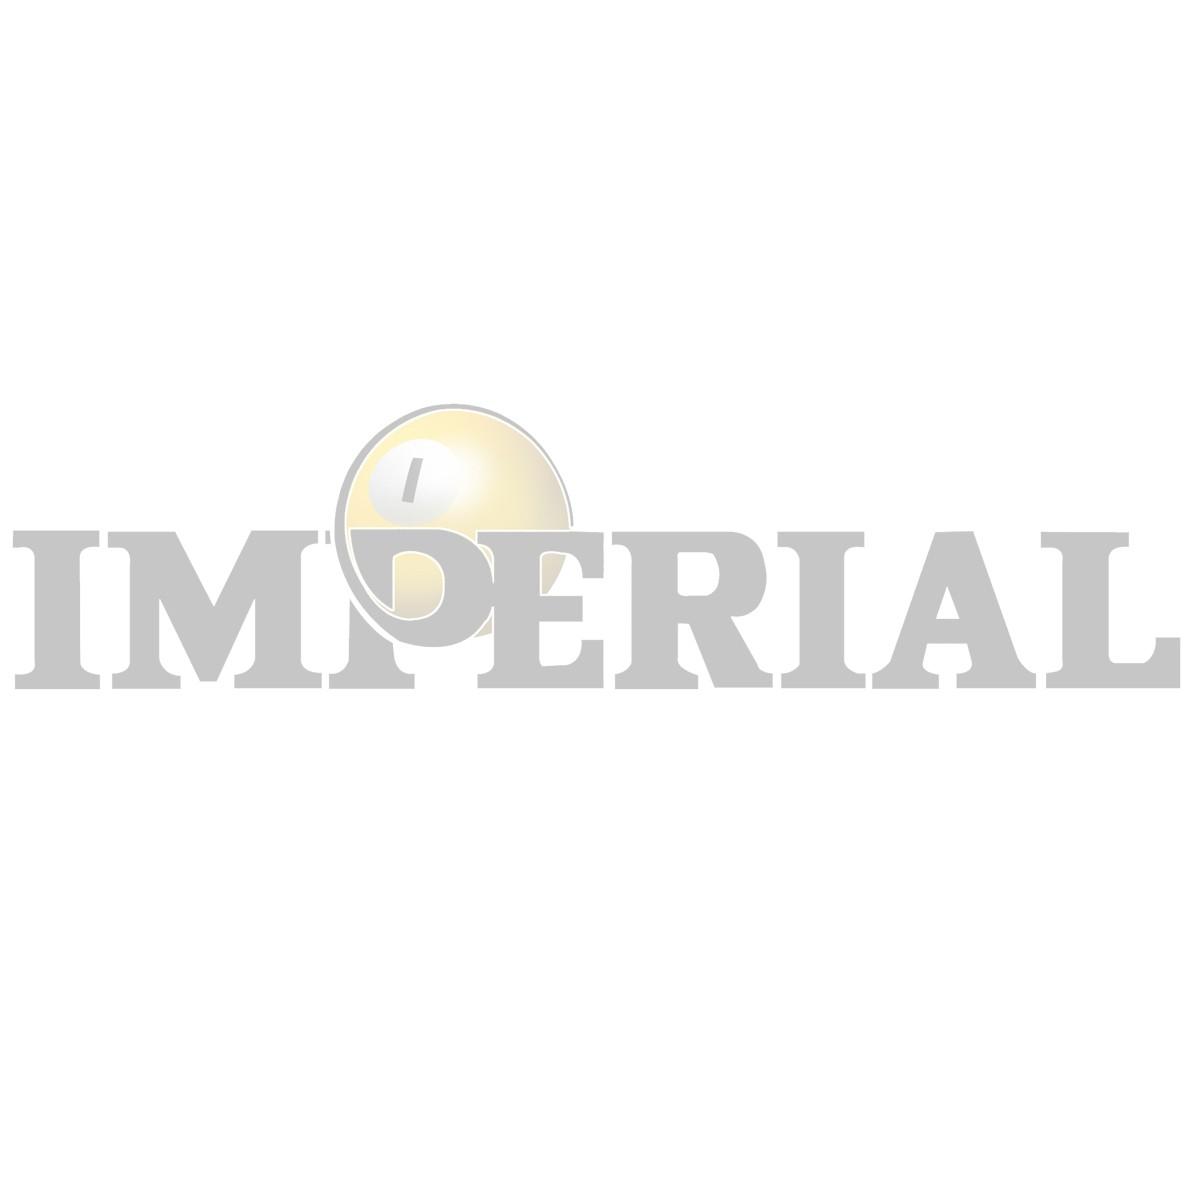 Super Aramith Professional 2 1/4-in. Billiard Ball Set